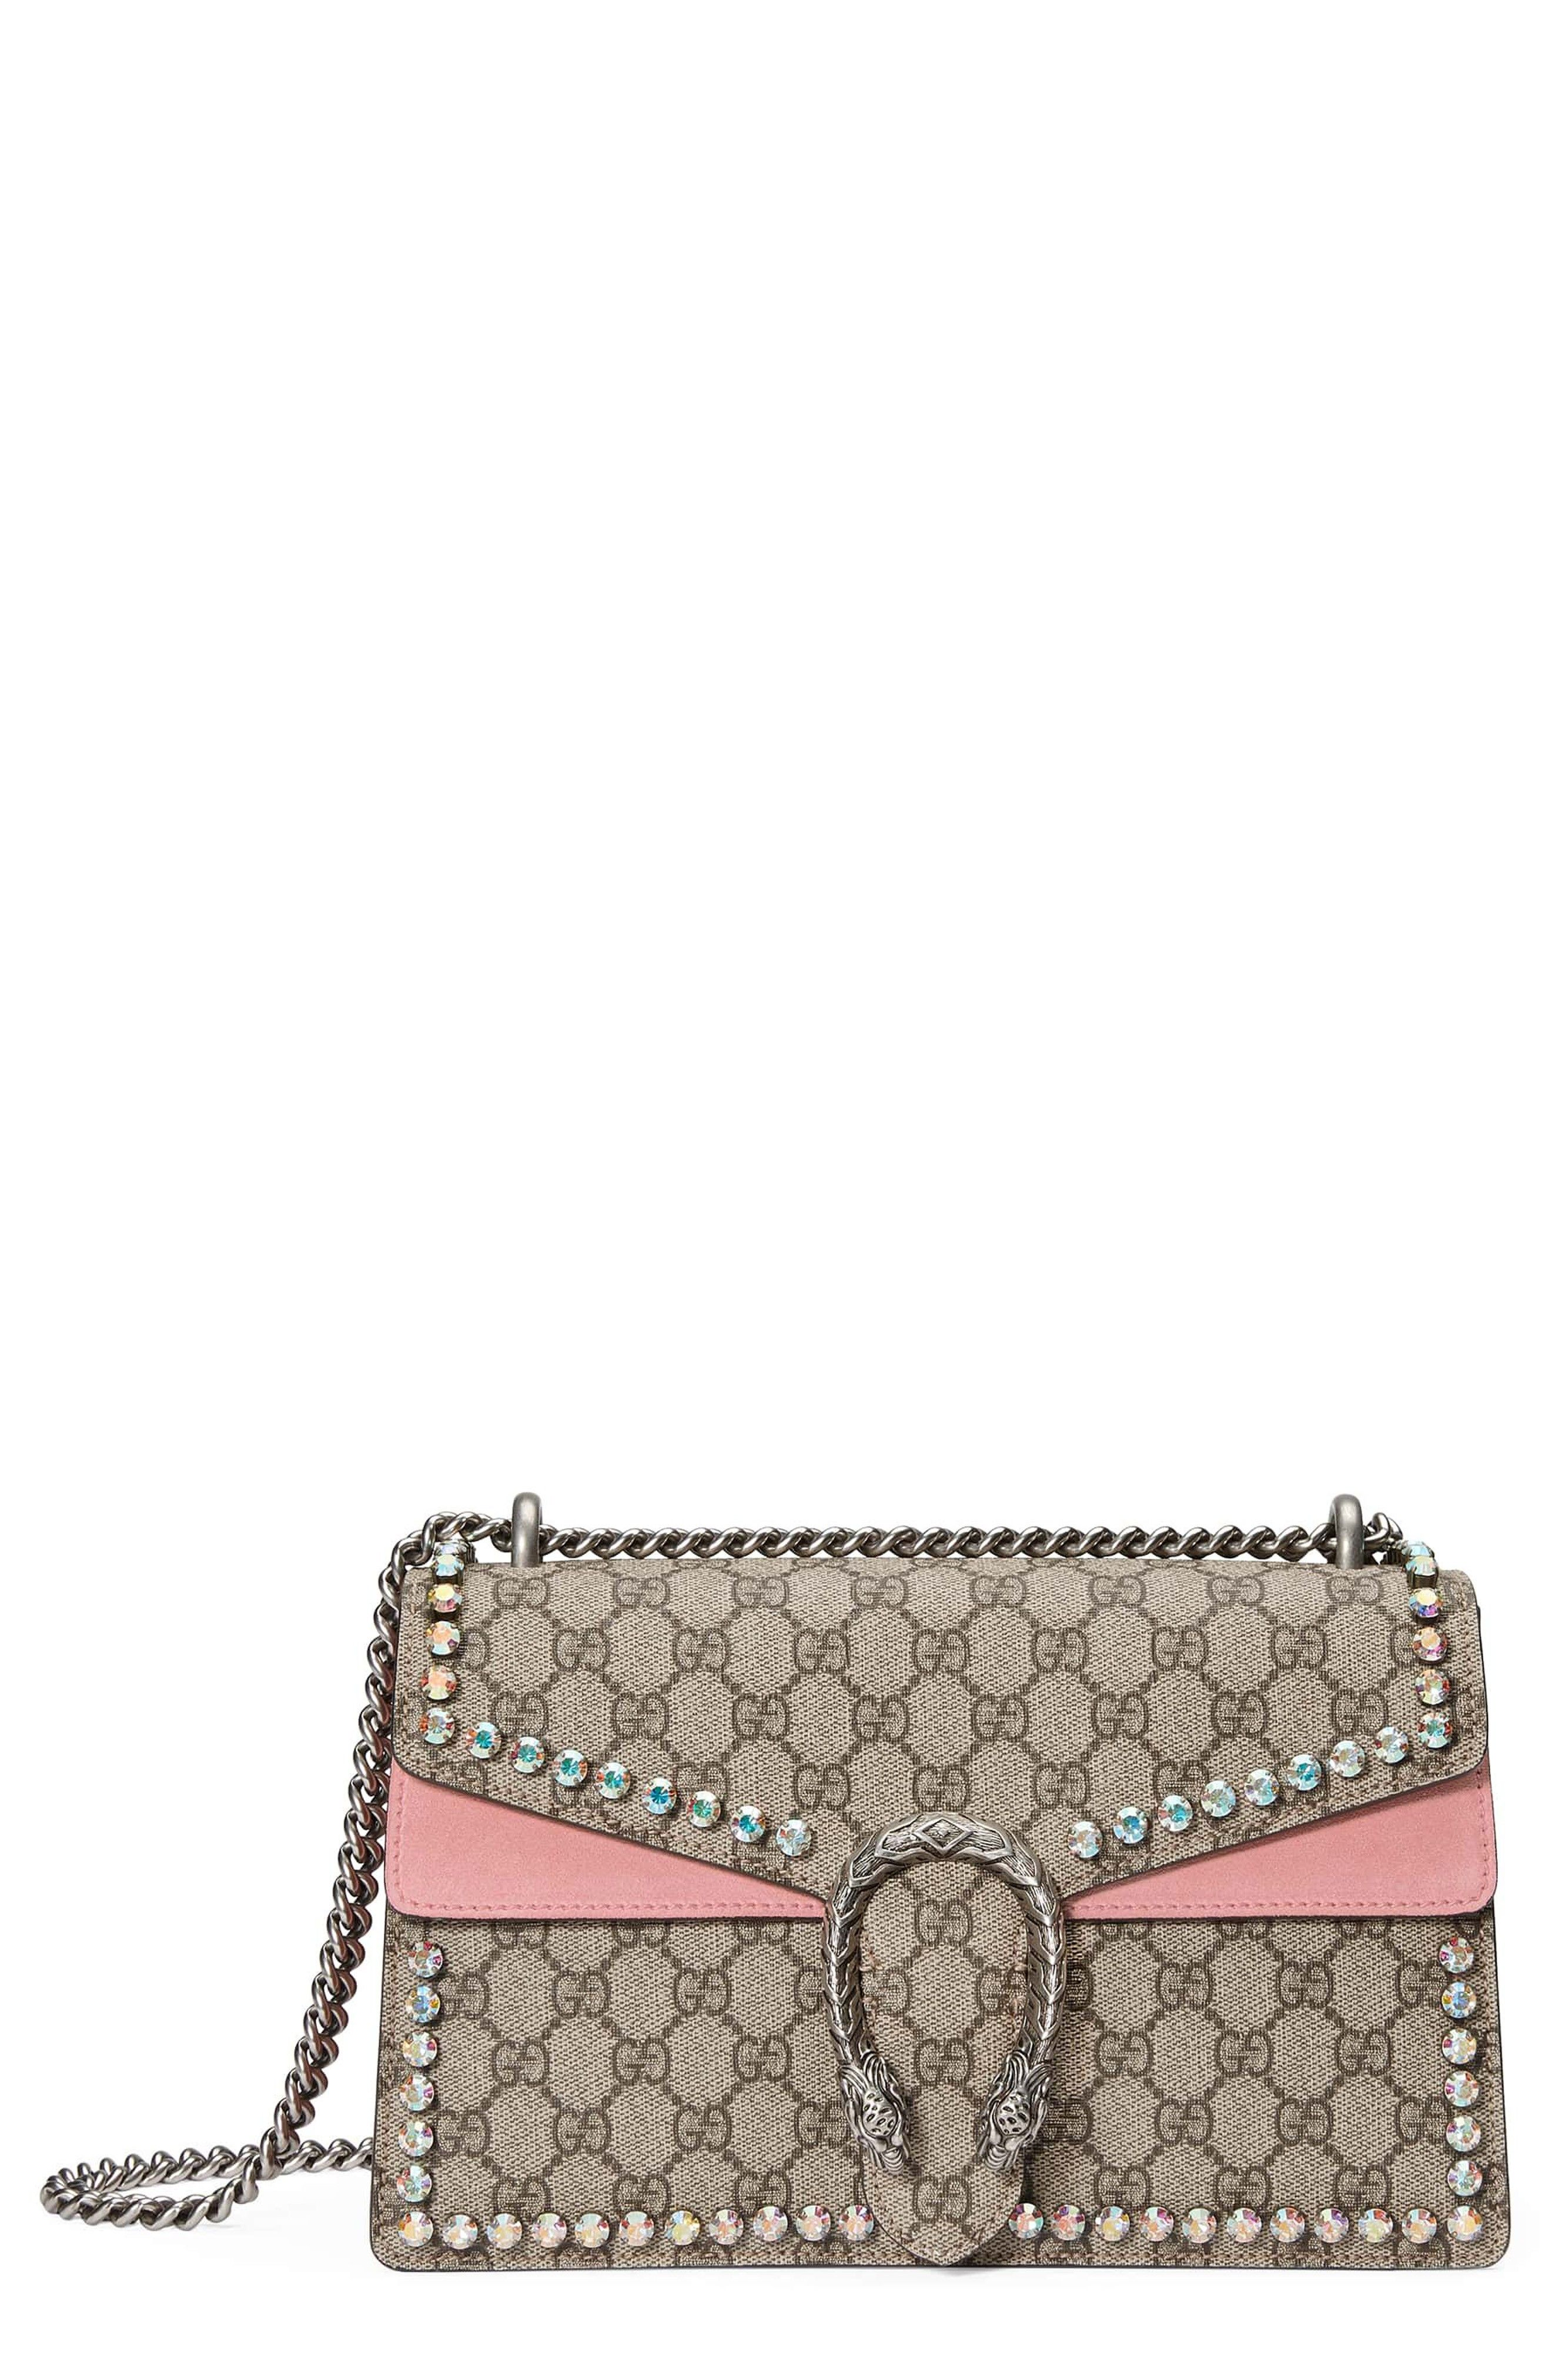 b7c4742b056c New GUCCI Small Dionysus Crystal Embellished GG Supreme Canvas Suede Shoulder  Bag online. Find the